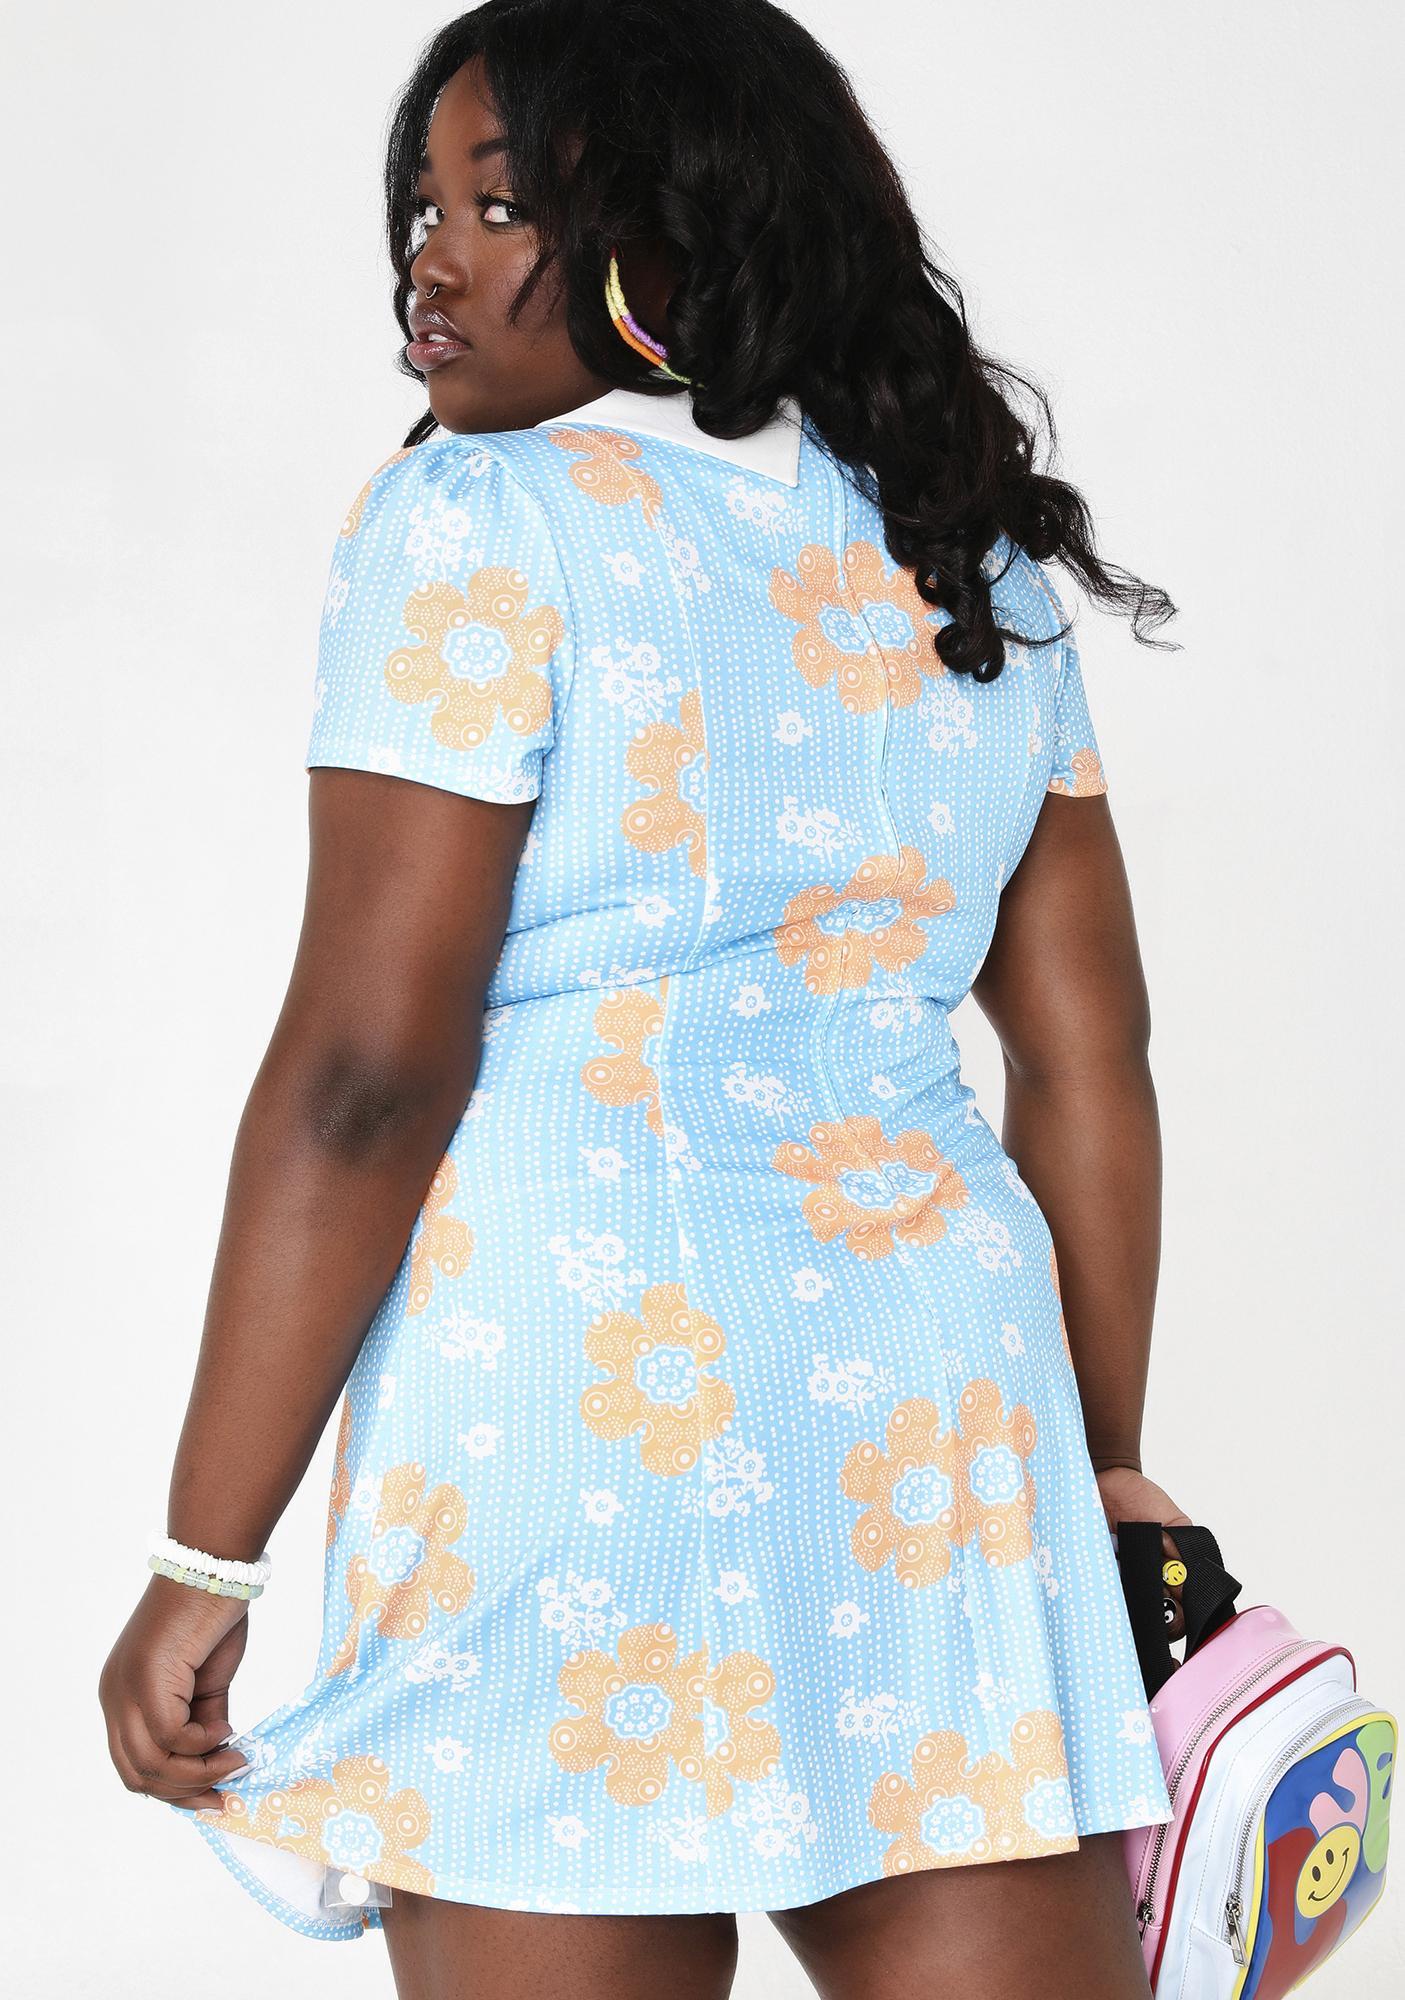 Current Mood On Harmony Lane Floral Dress